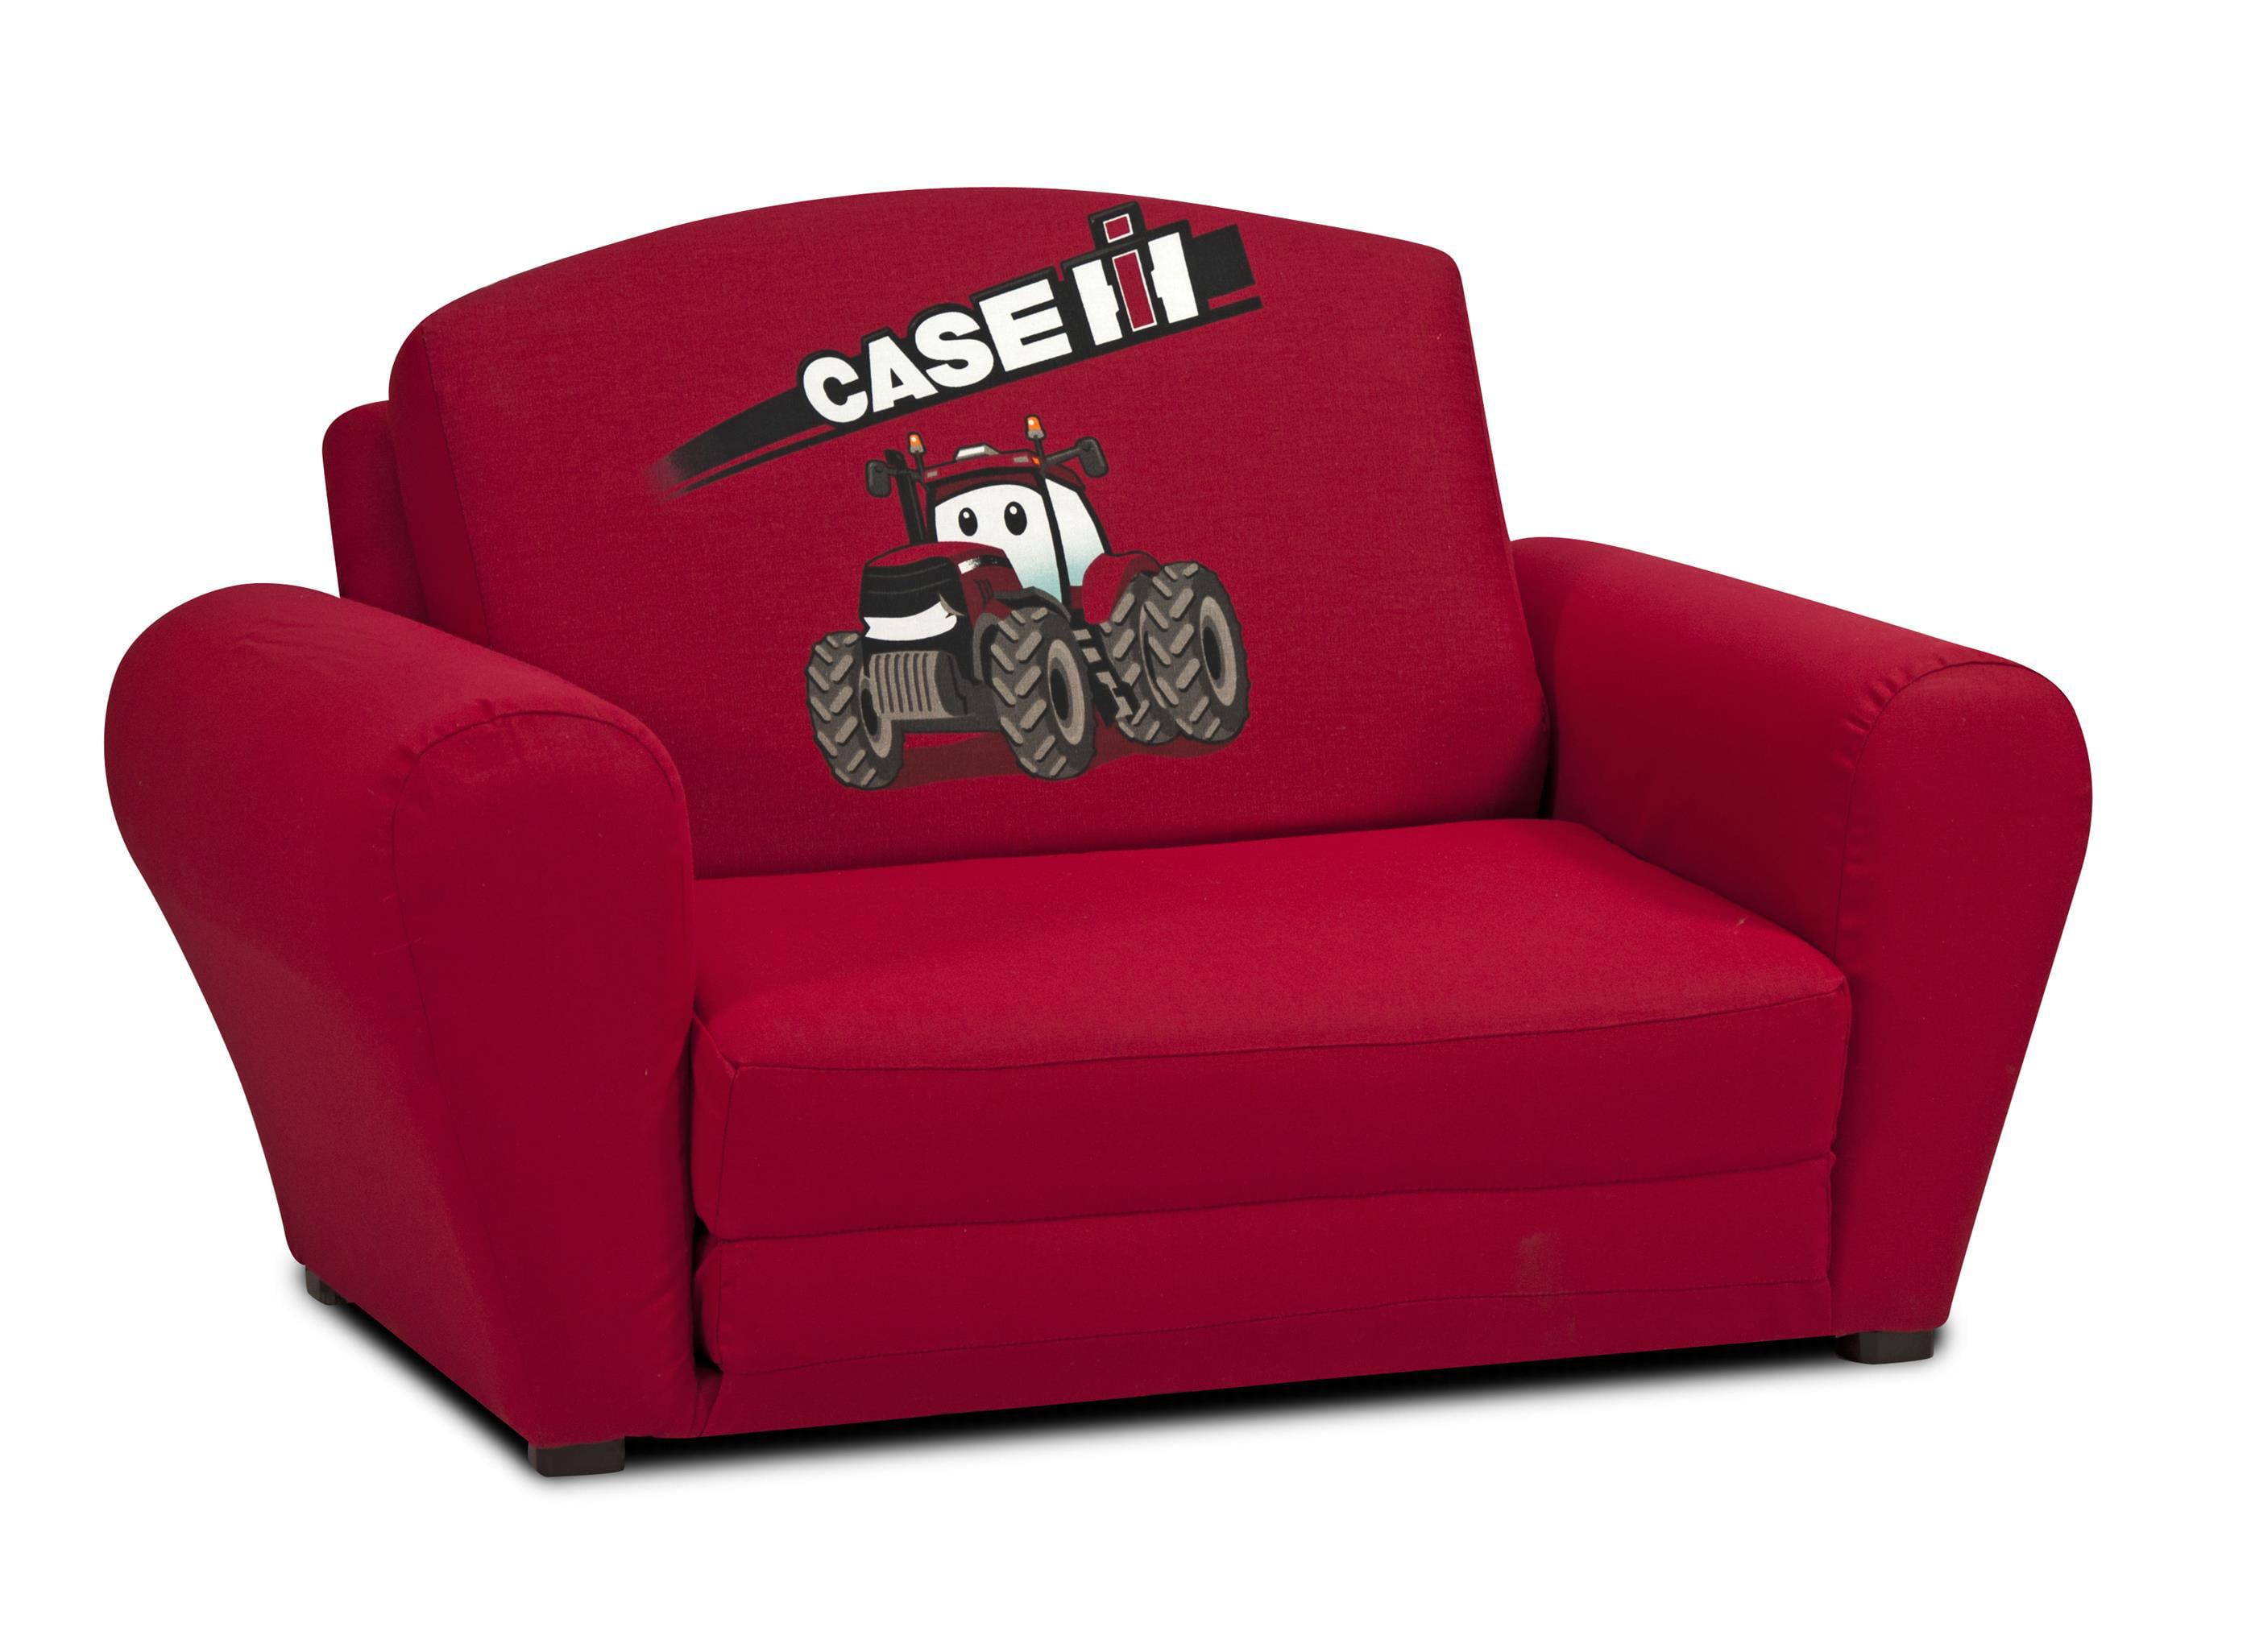 Case International Harvester Kids Sleepover Sofa in Red by Kidz World